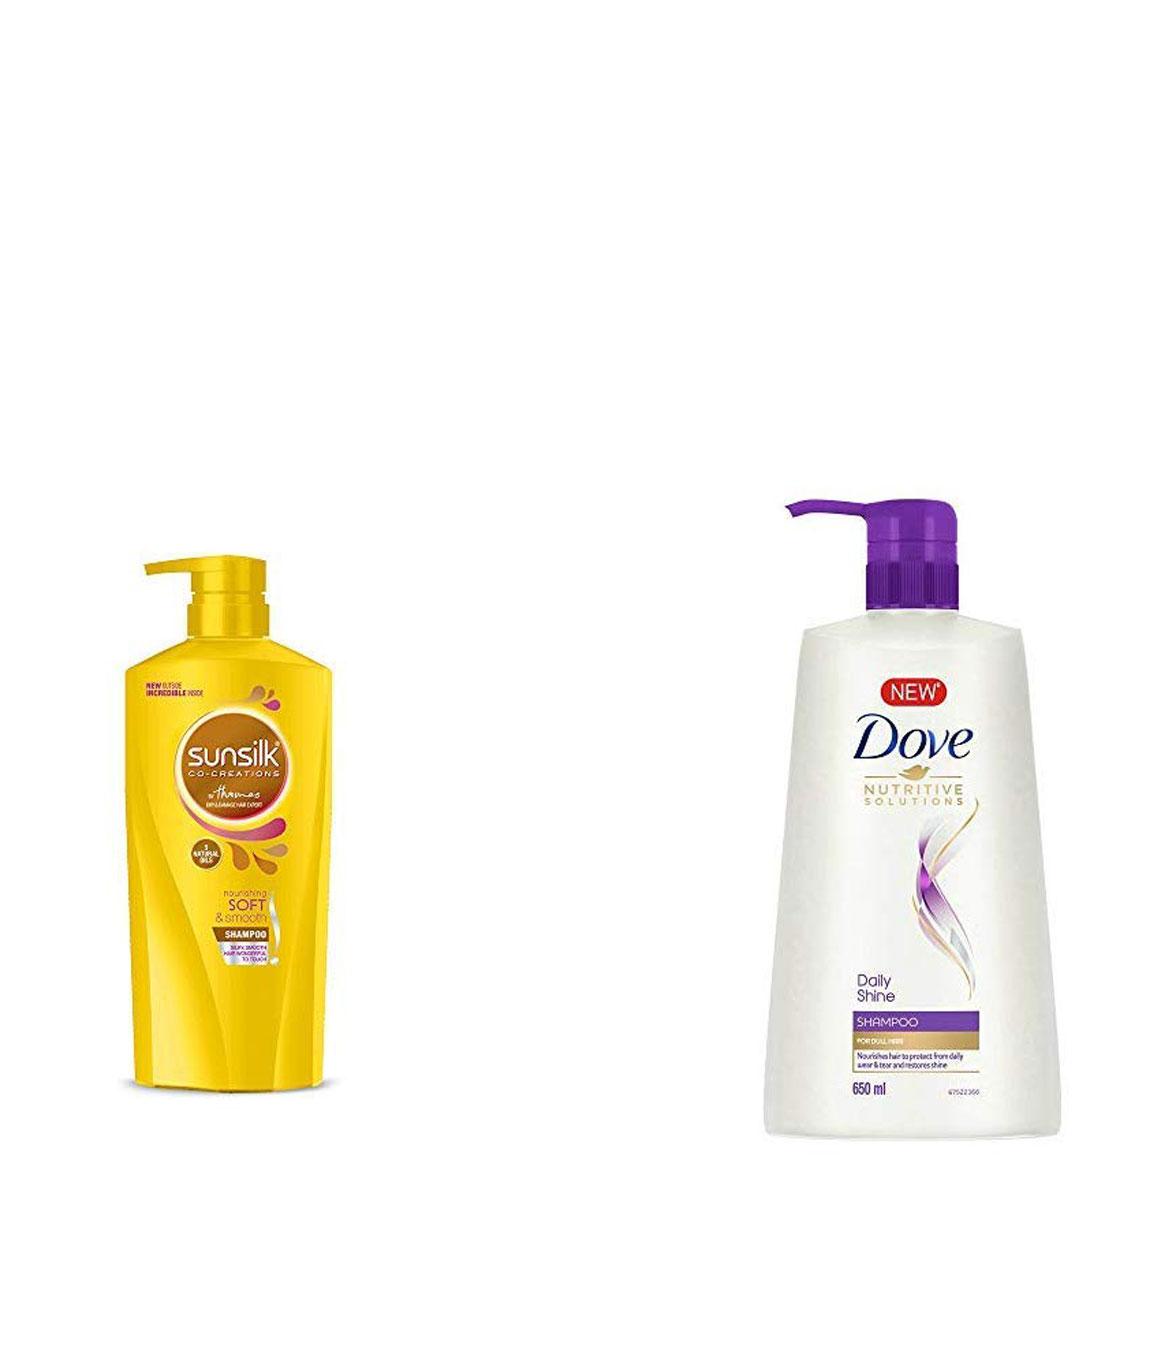 Sunsilk Nourishing Soft & Smooth Shampoo 650ml & Dove Daily Shine Shampoo, 650ml